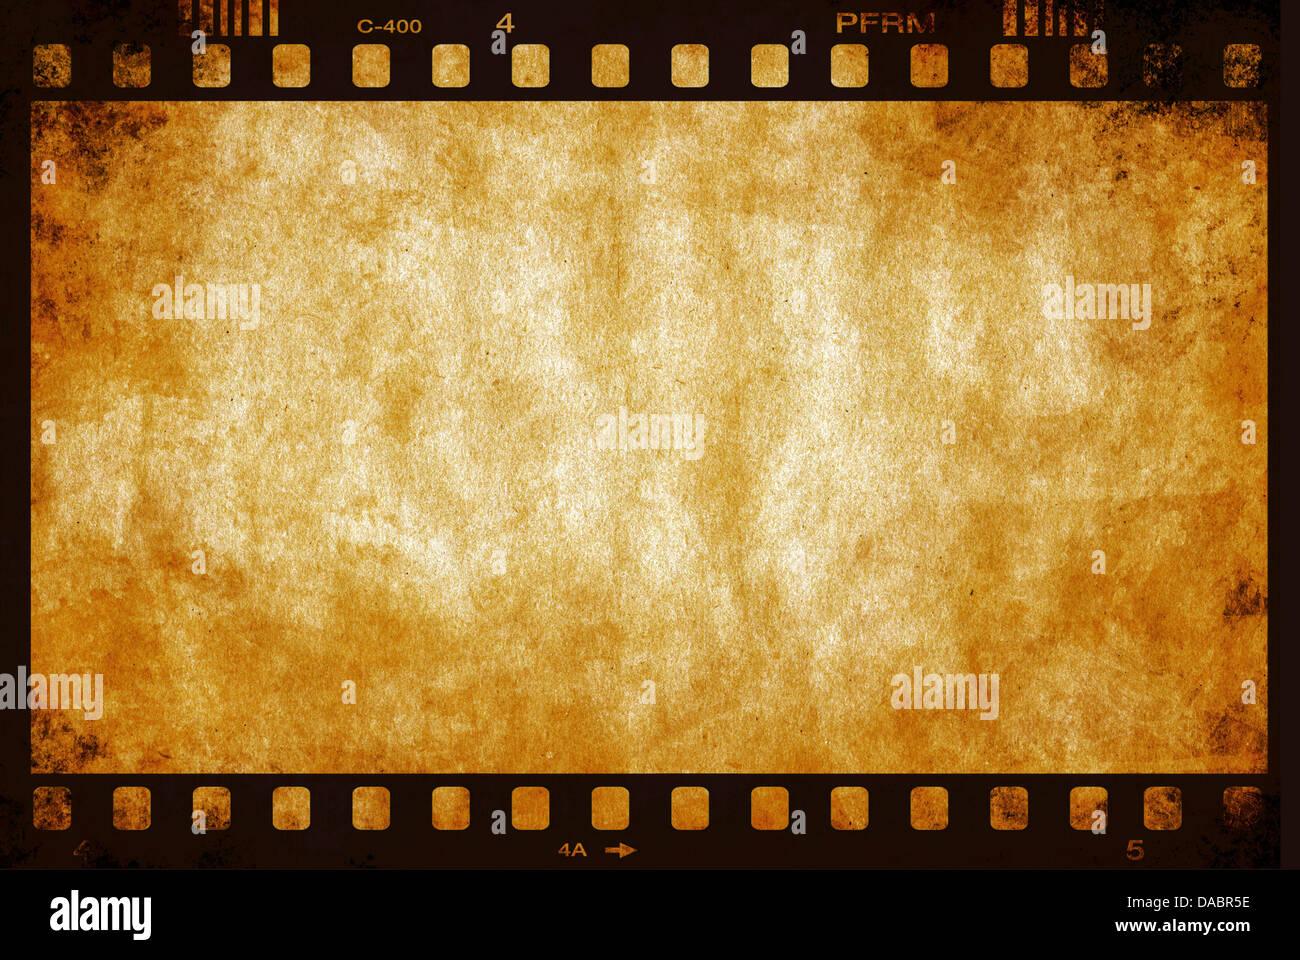 Photographic Film Frame Stock Photos & Photographic Film Frame Stock ...